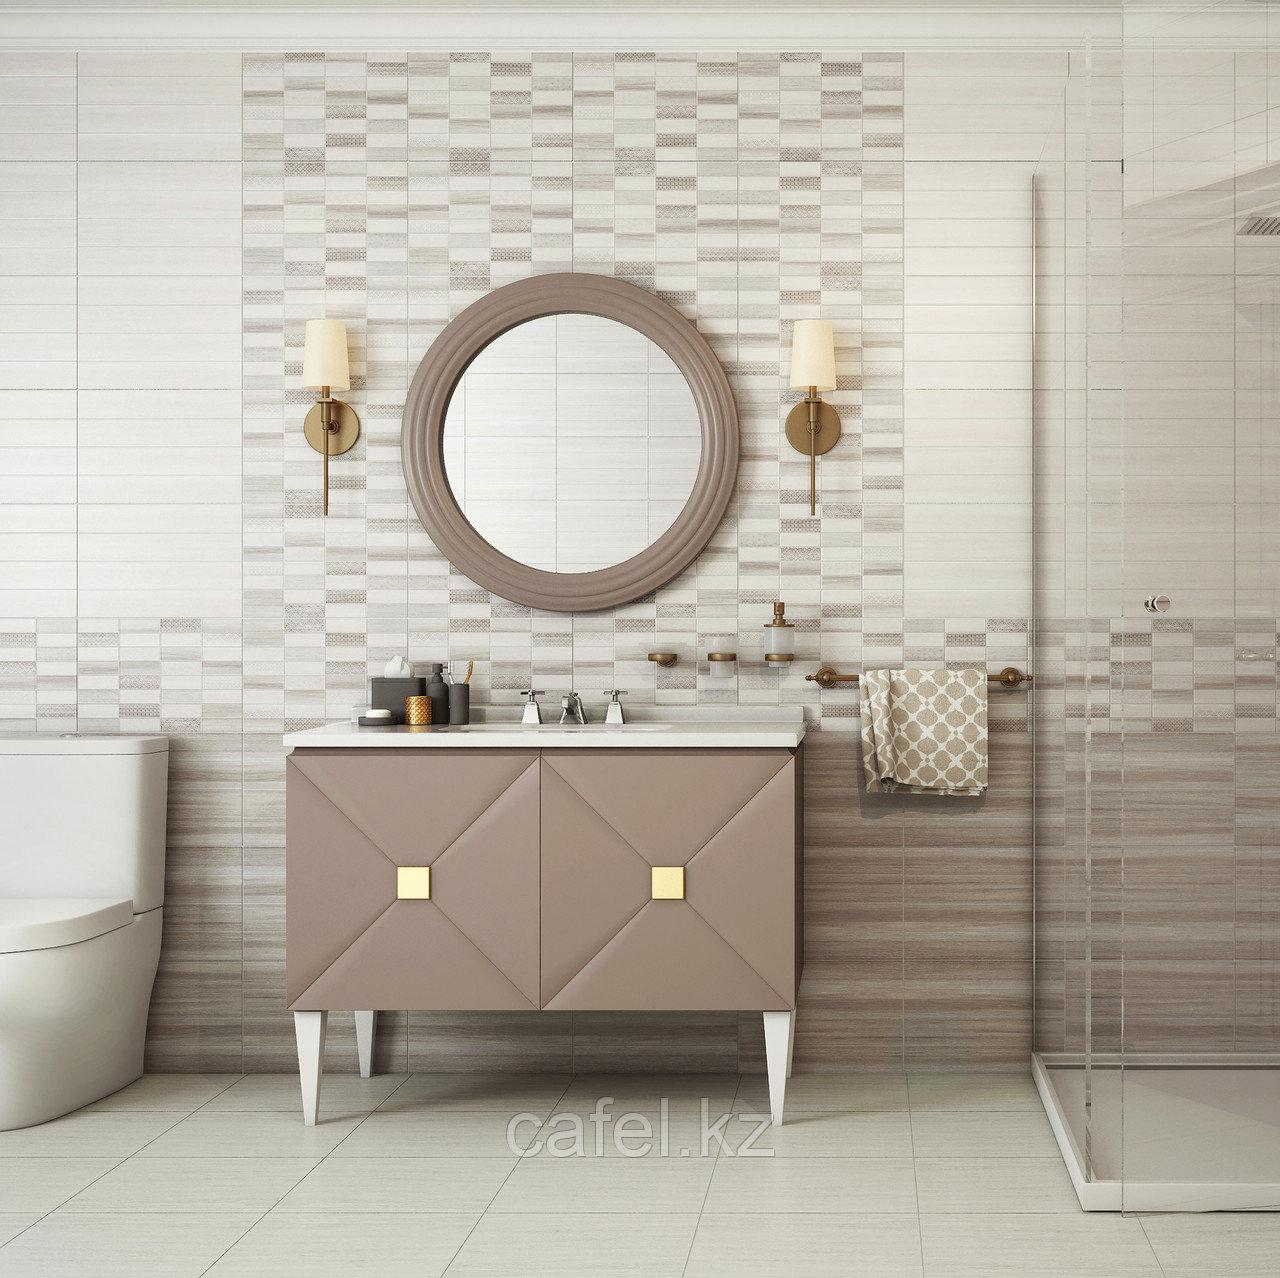 Кафель | Плитка настенная 28х40 Нидвуд | Nidwood